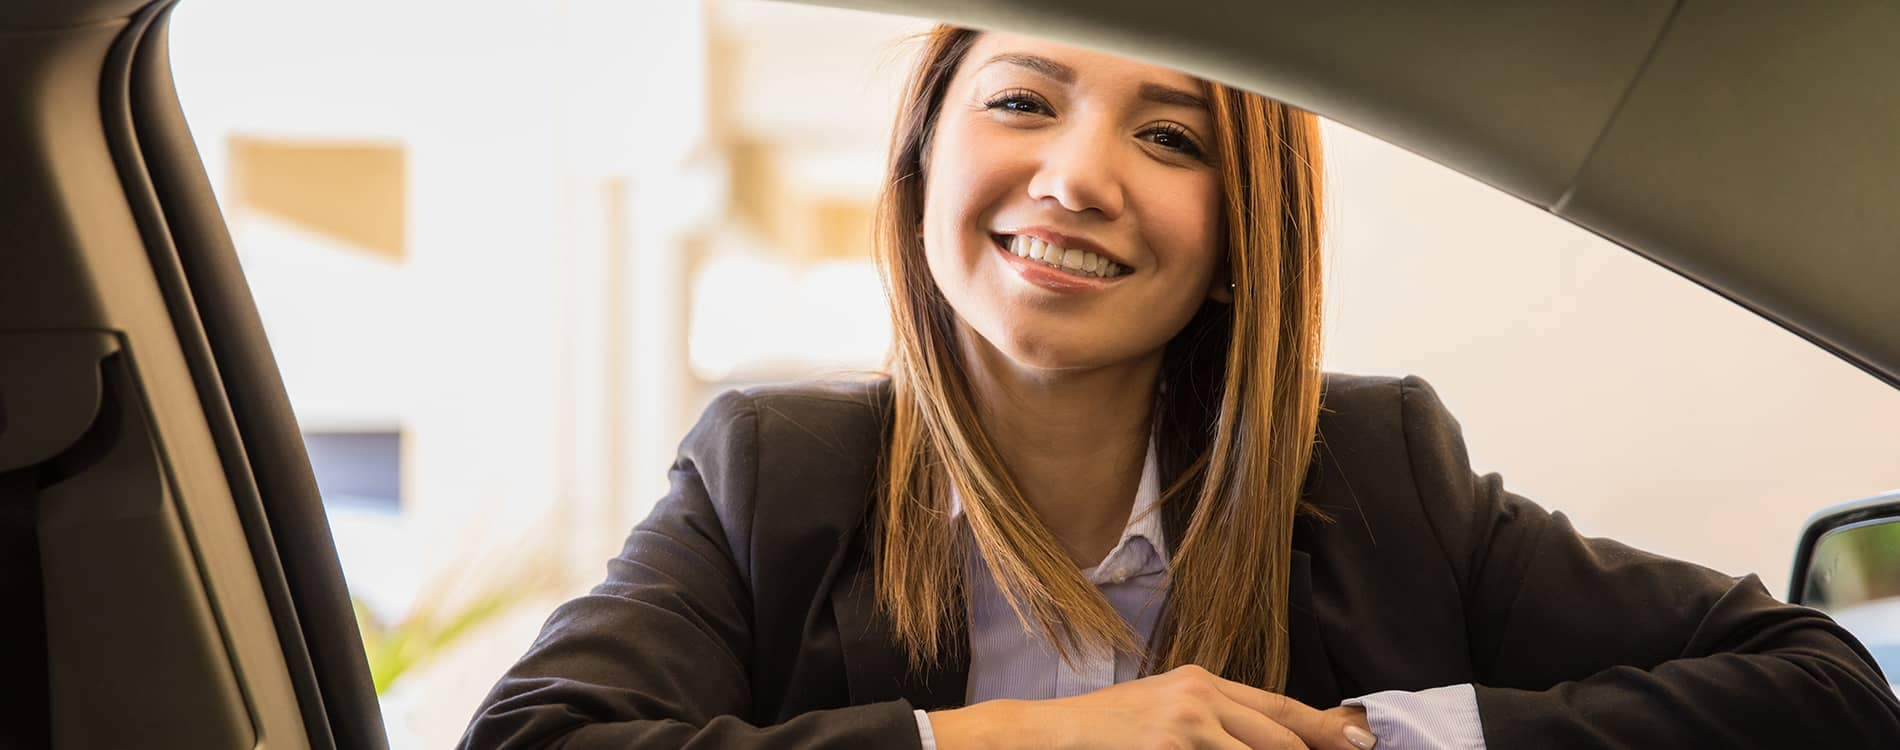 Hispanic Woman Car Sales